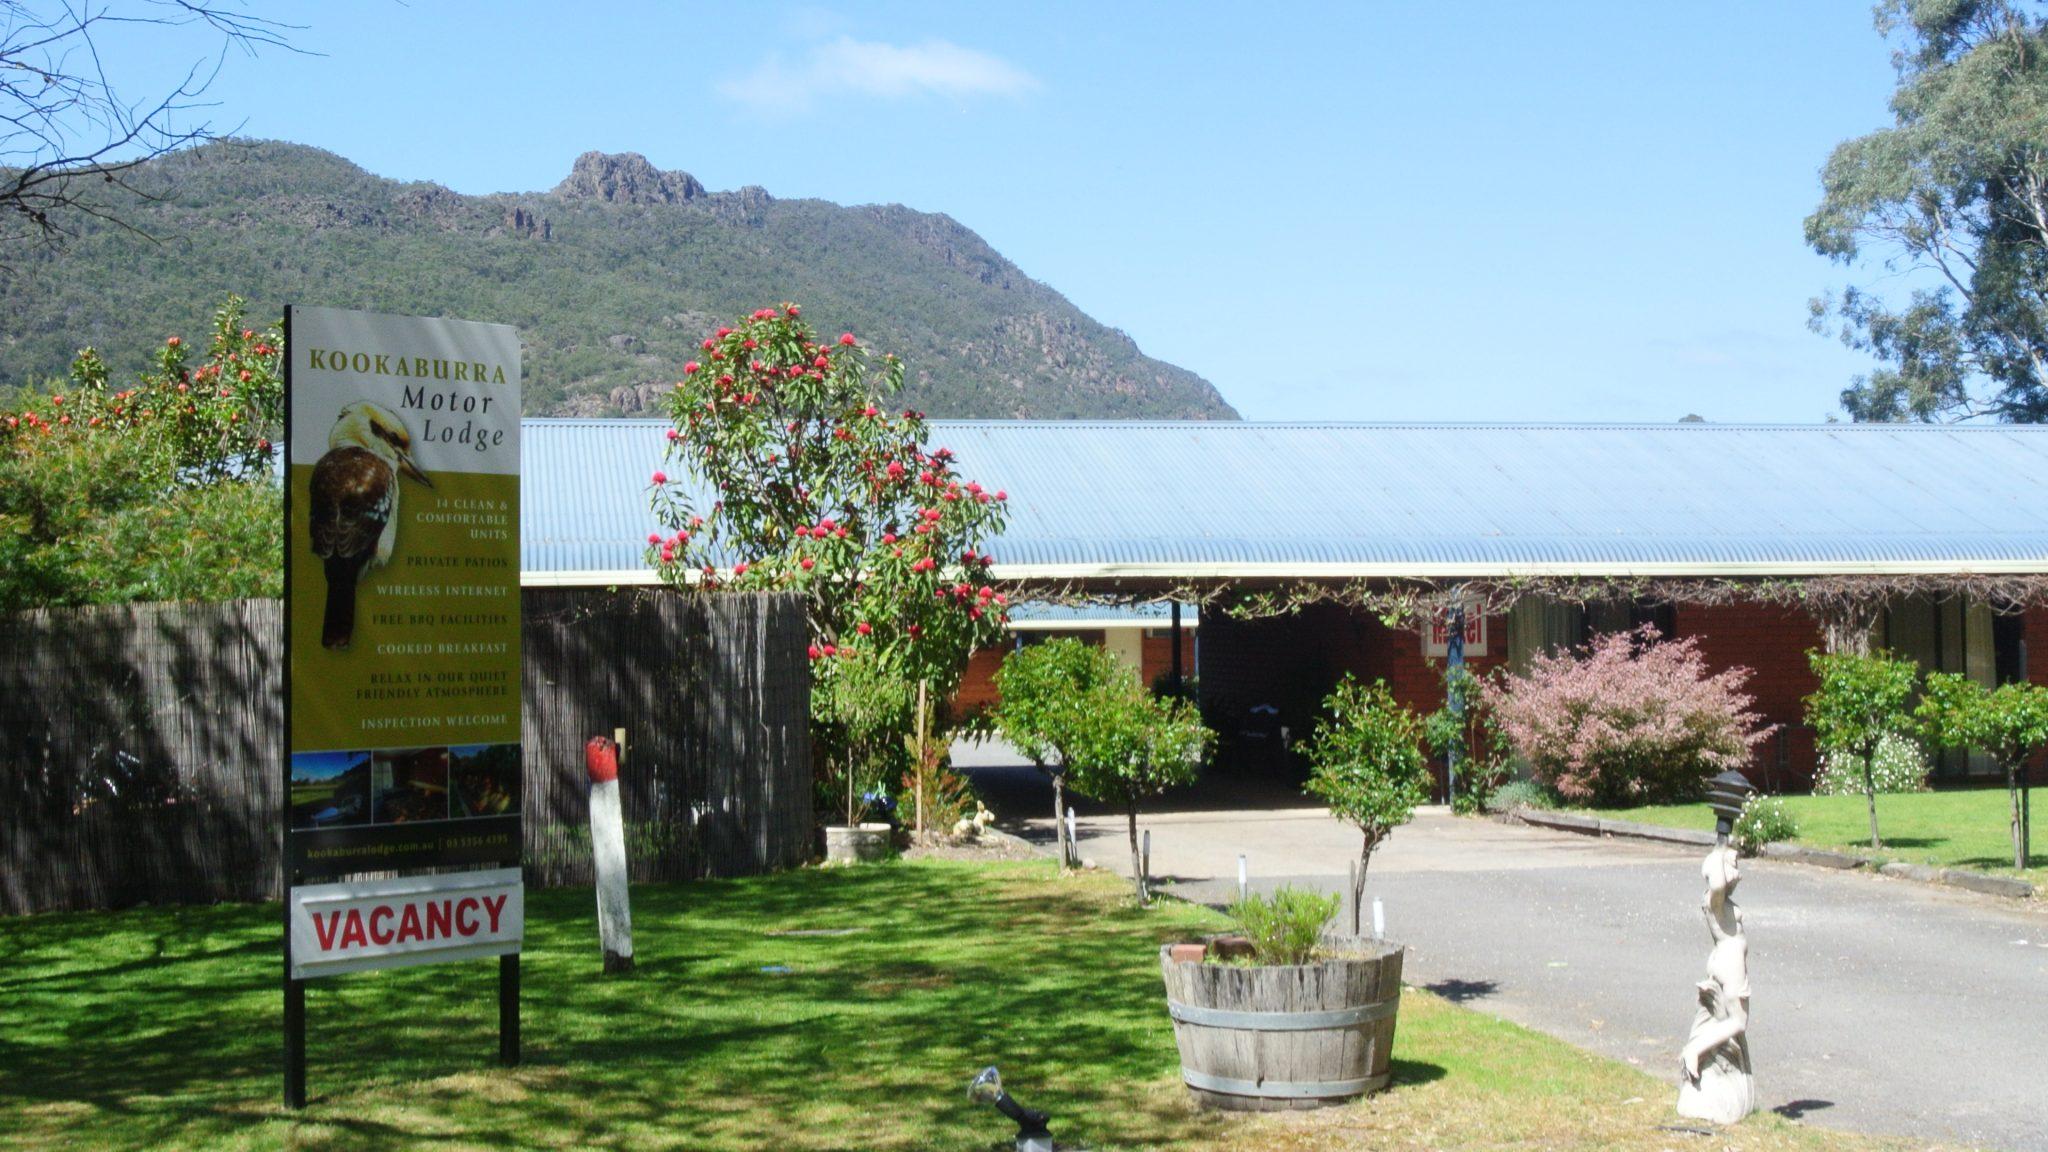 Kookaburra Motor Lodge Halls Gap Tourisim